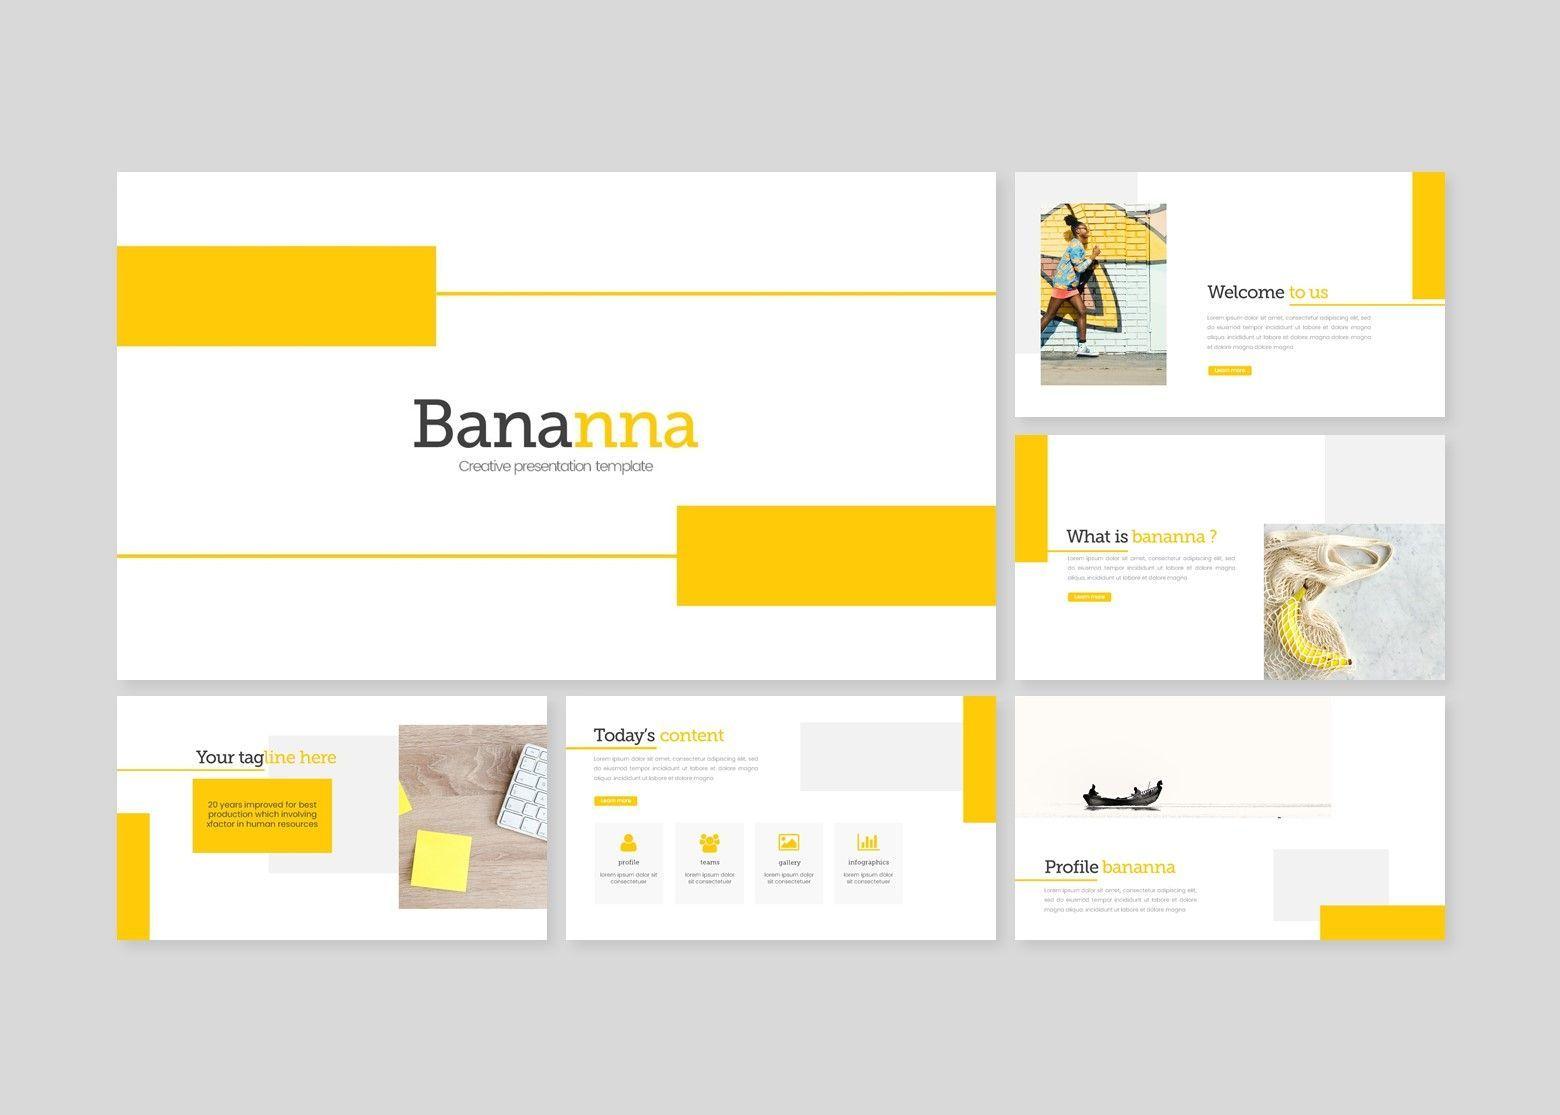 Bananna – Creative Google Slide Business Template, Slide 2, 08448, Business Models — PoweredTemplate.com